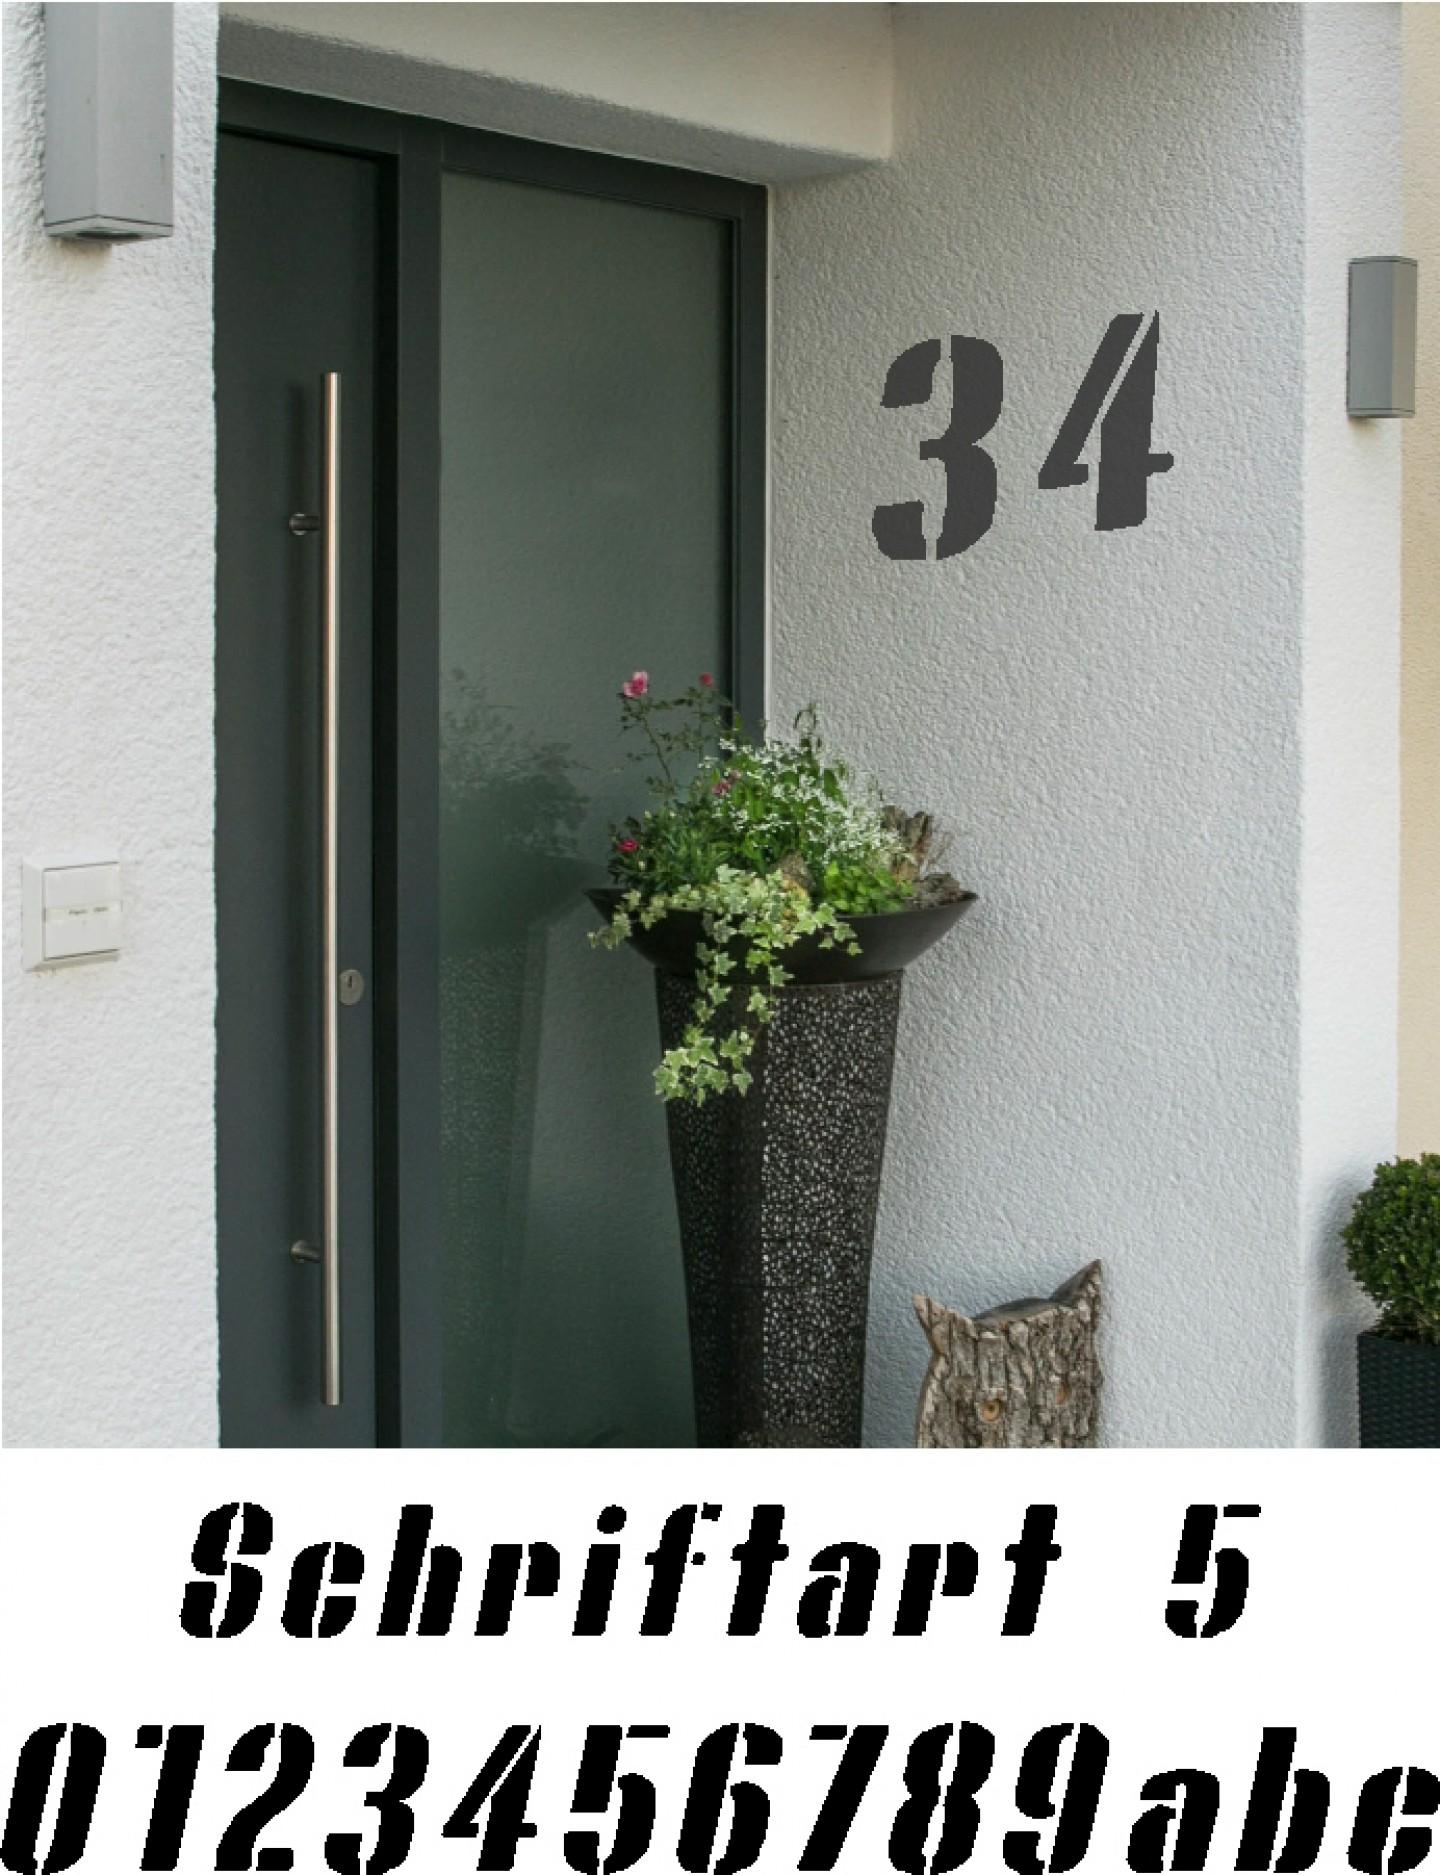 Hausnummer Schablonen Schriftart 5